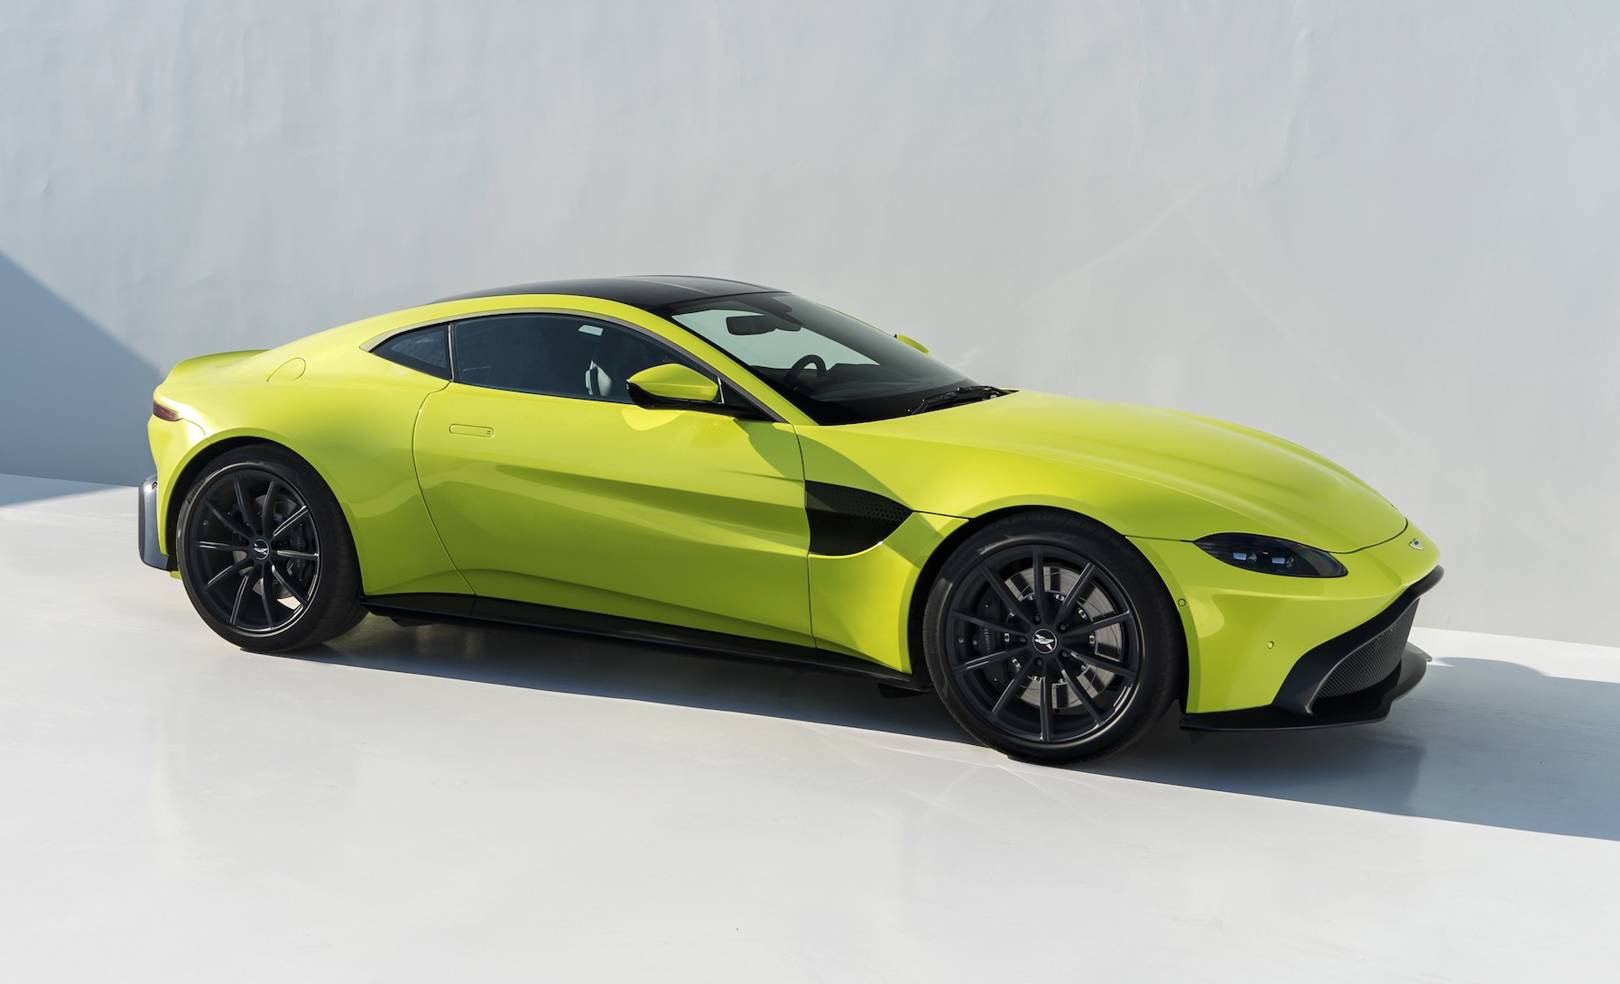 Aston Martin Vantage Entrylevel Luxury With The Looks WIRED UK - Aston martin new car